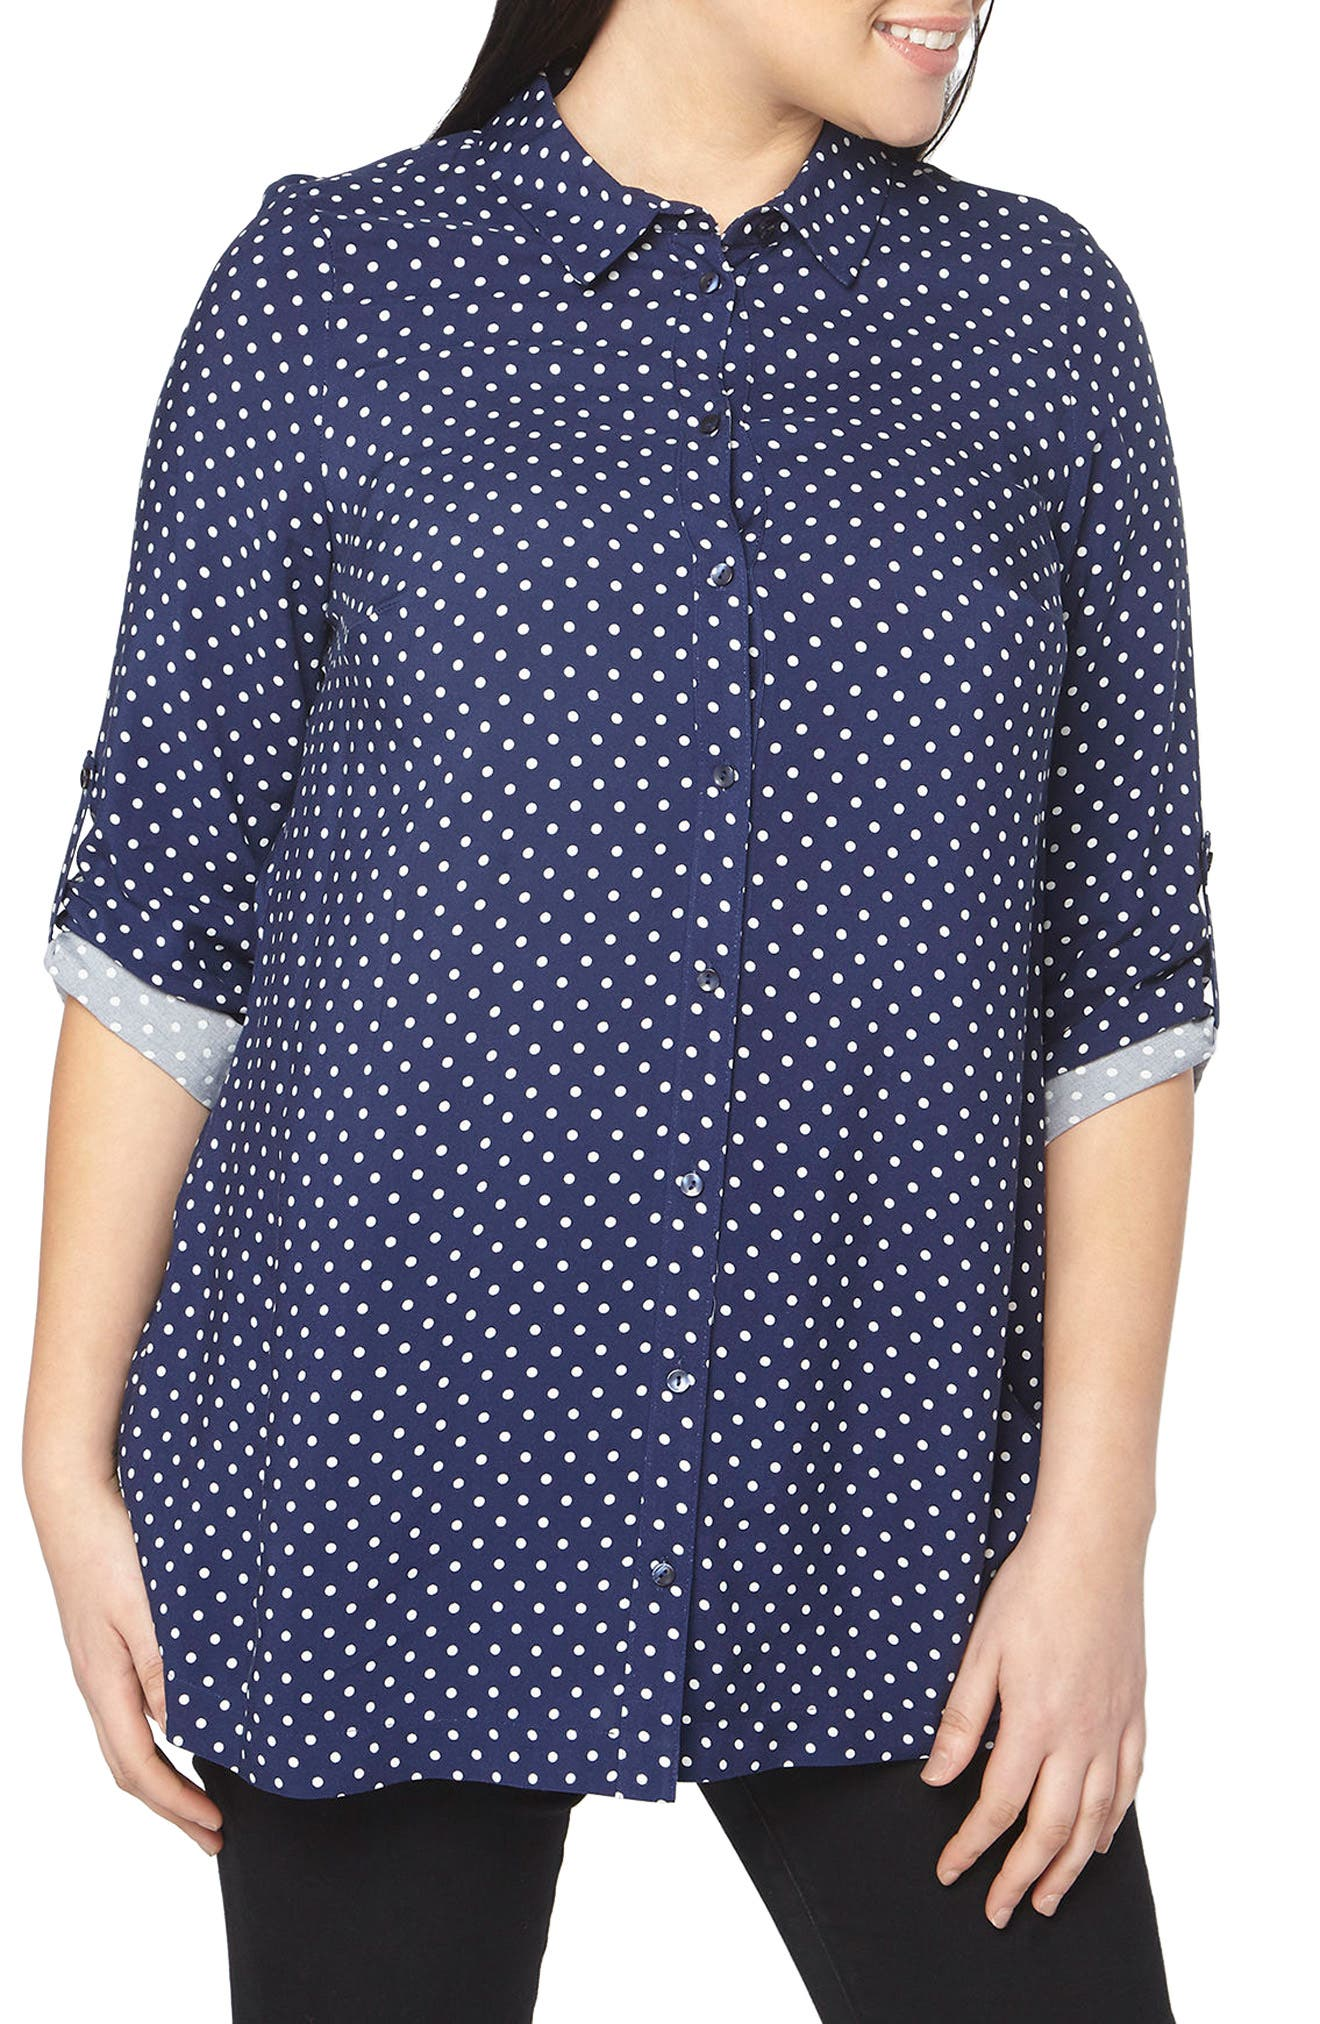 Evans Polka Dot Shirt (Plus Size)